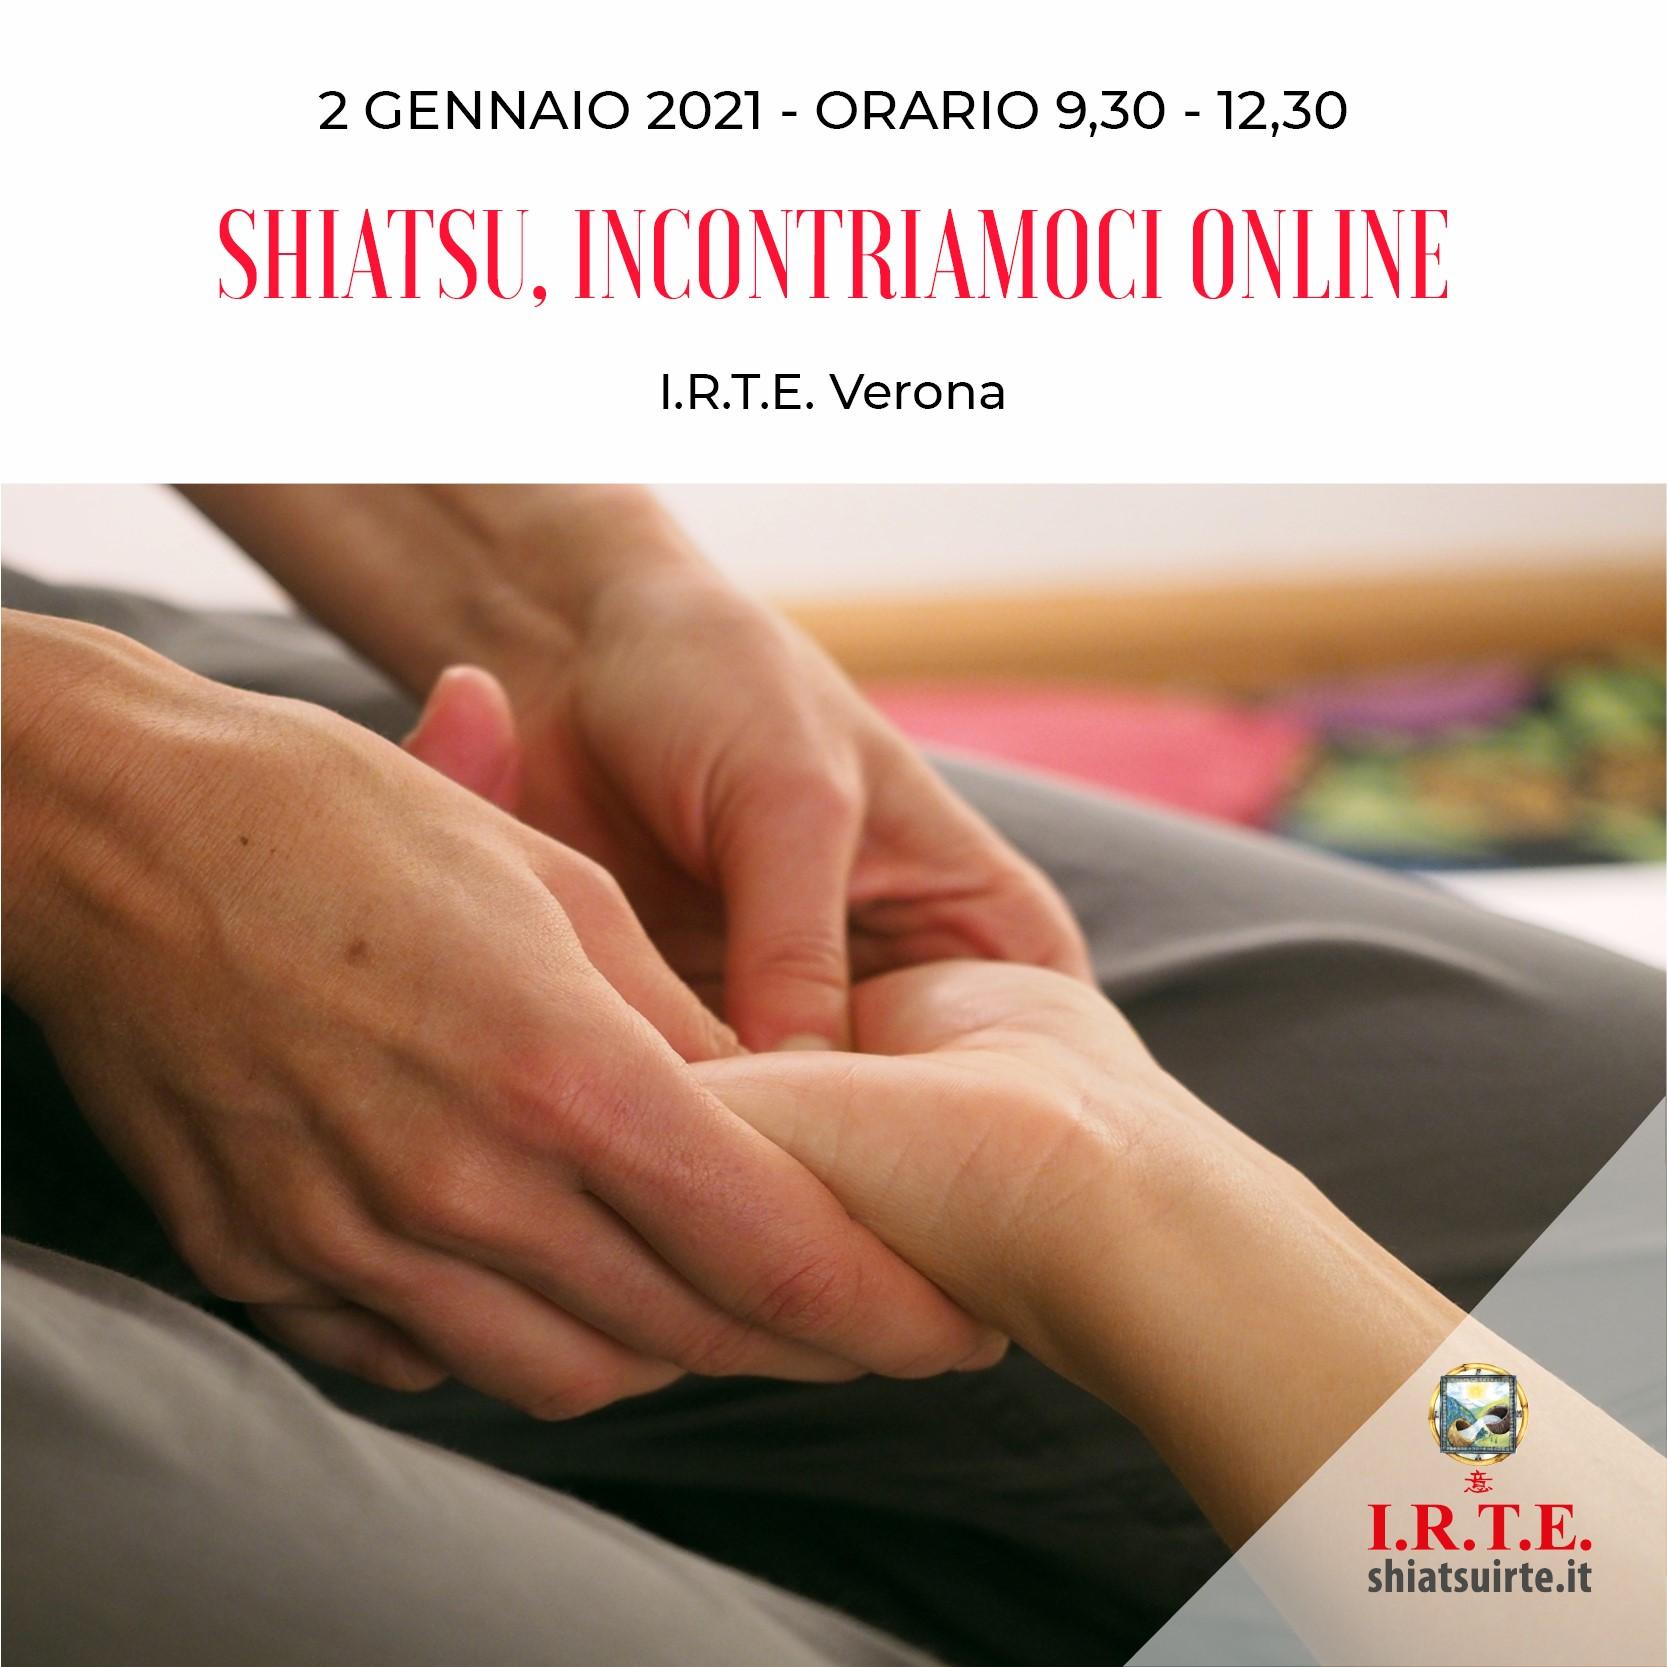 Verona, 02 Gennaio 2021 Incontriamoci online!